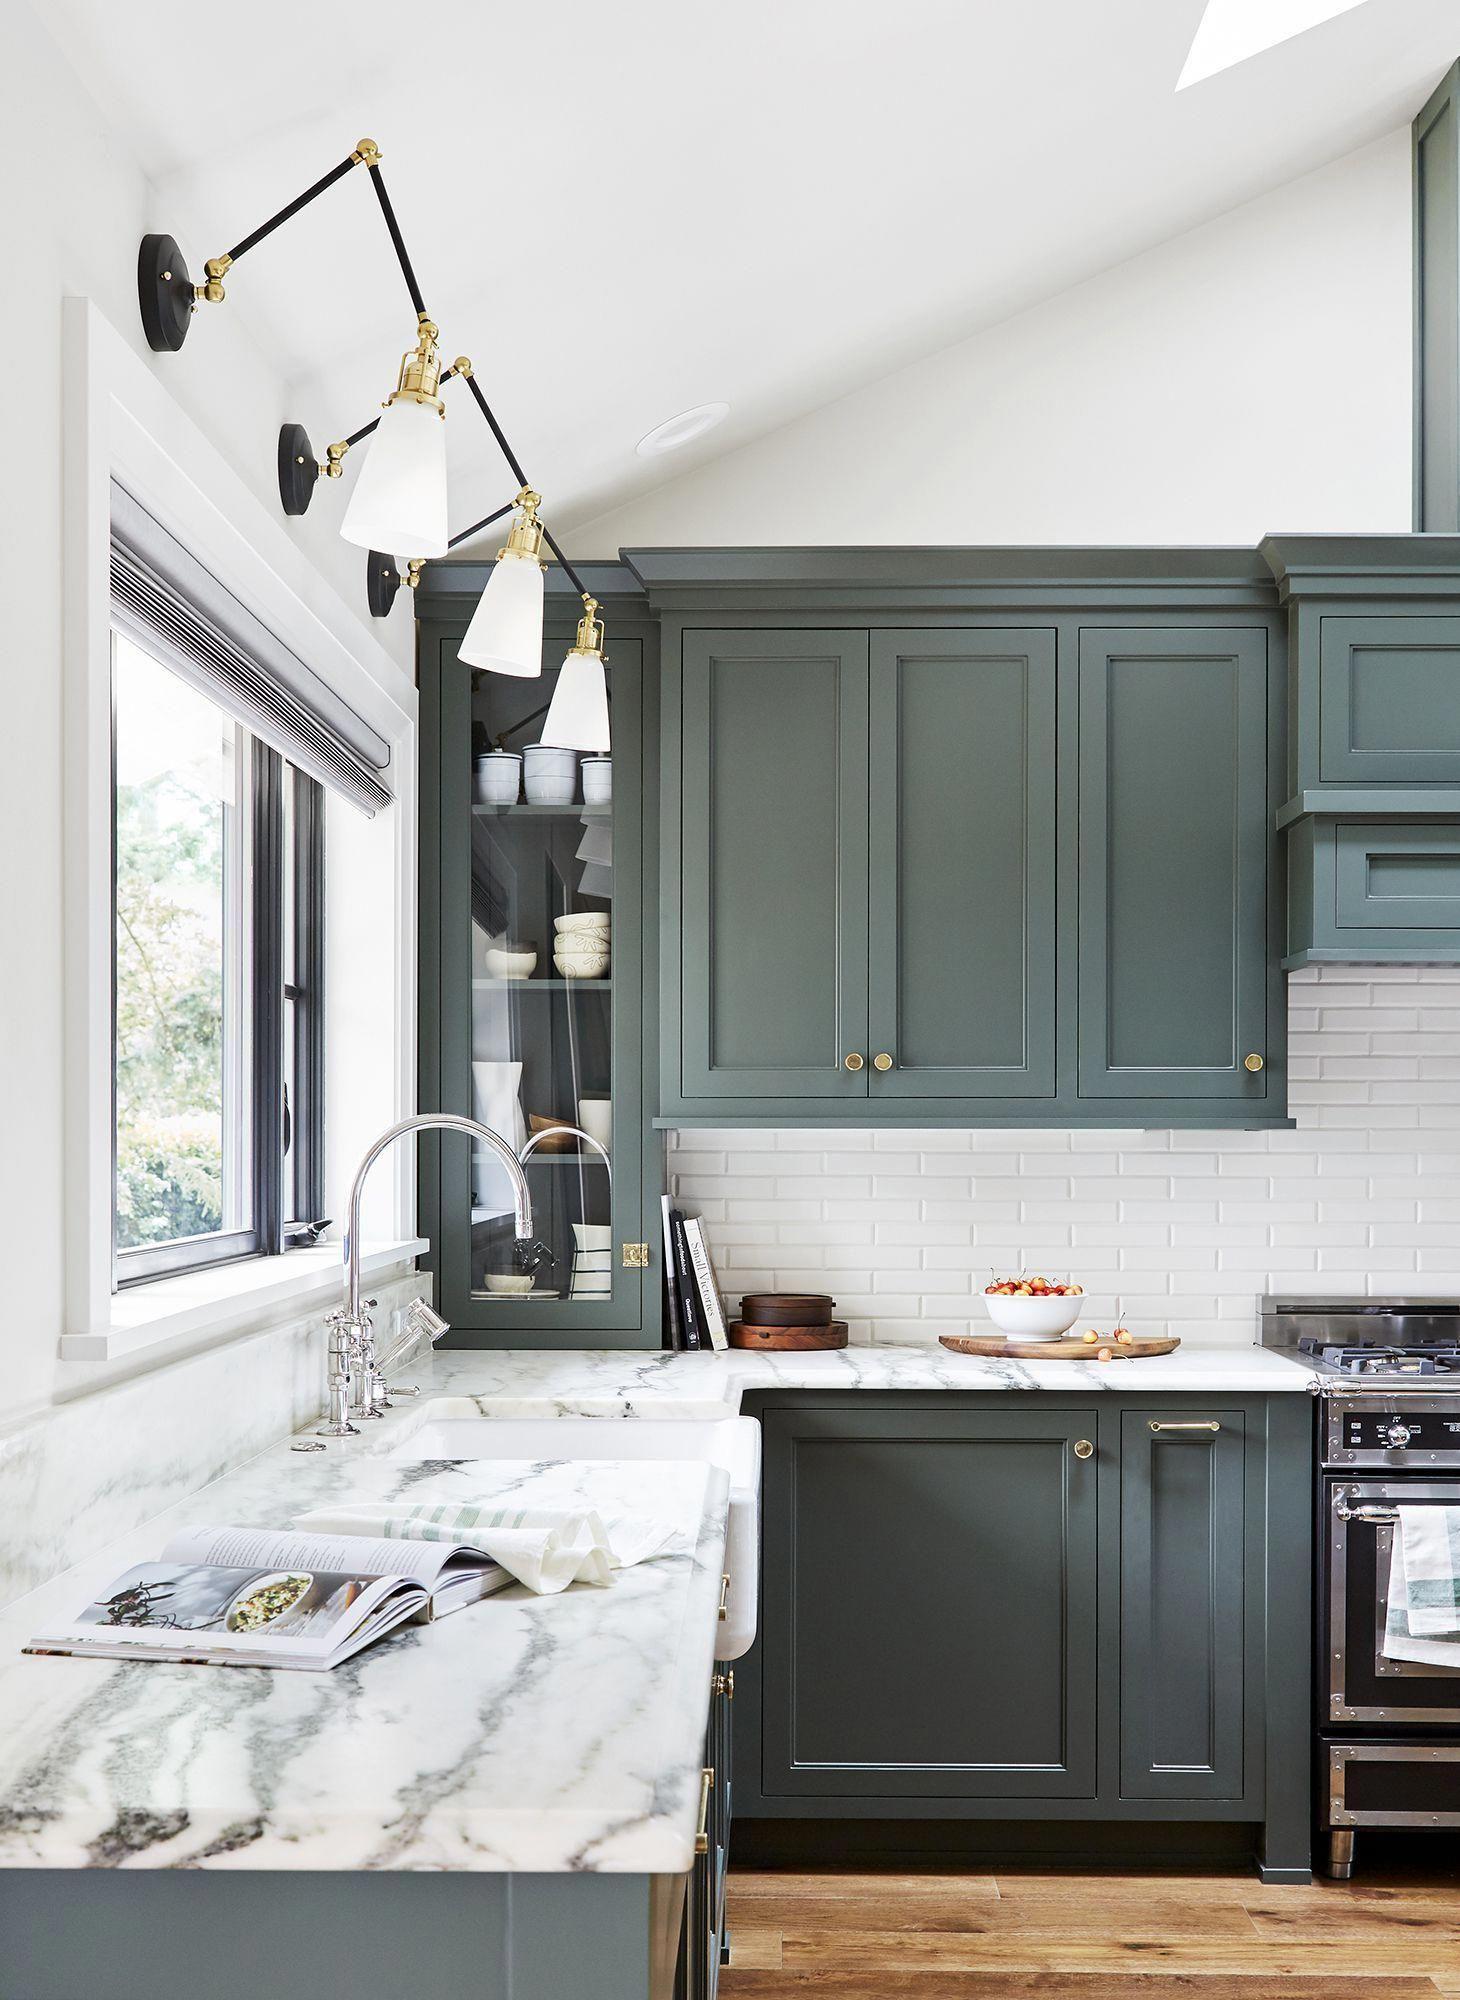 Pewter Green Sherwin Williams Cabinets Also House Tour For Ehd Pdx House Modernkitchen Arredamento Casa Cucina Retro Idee Per La Cucina